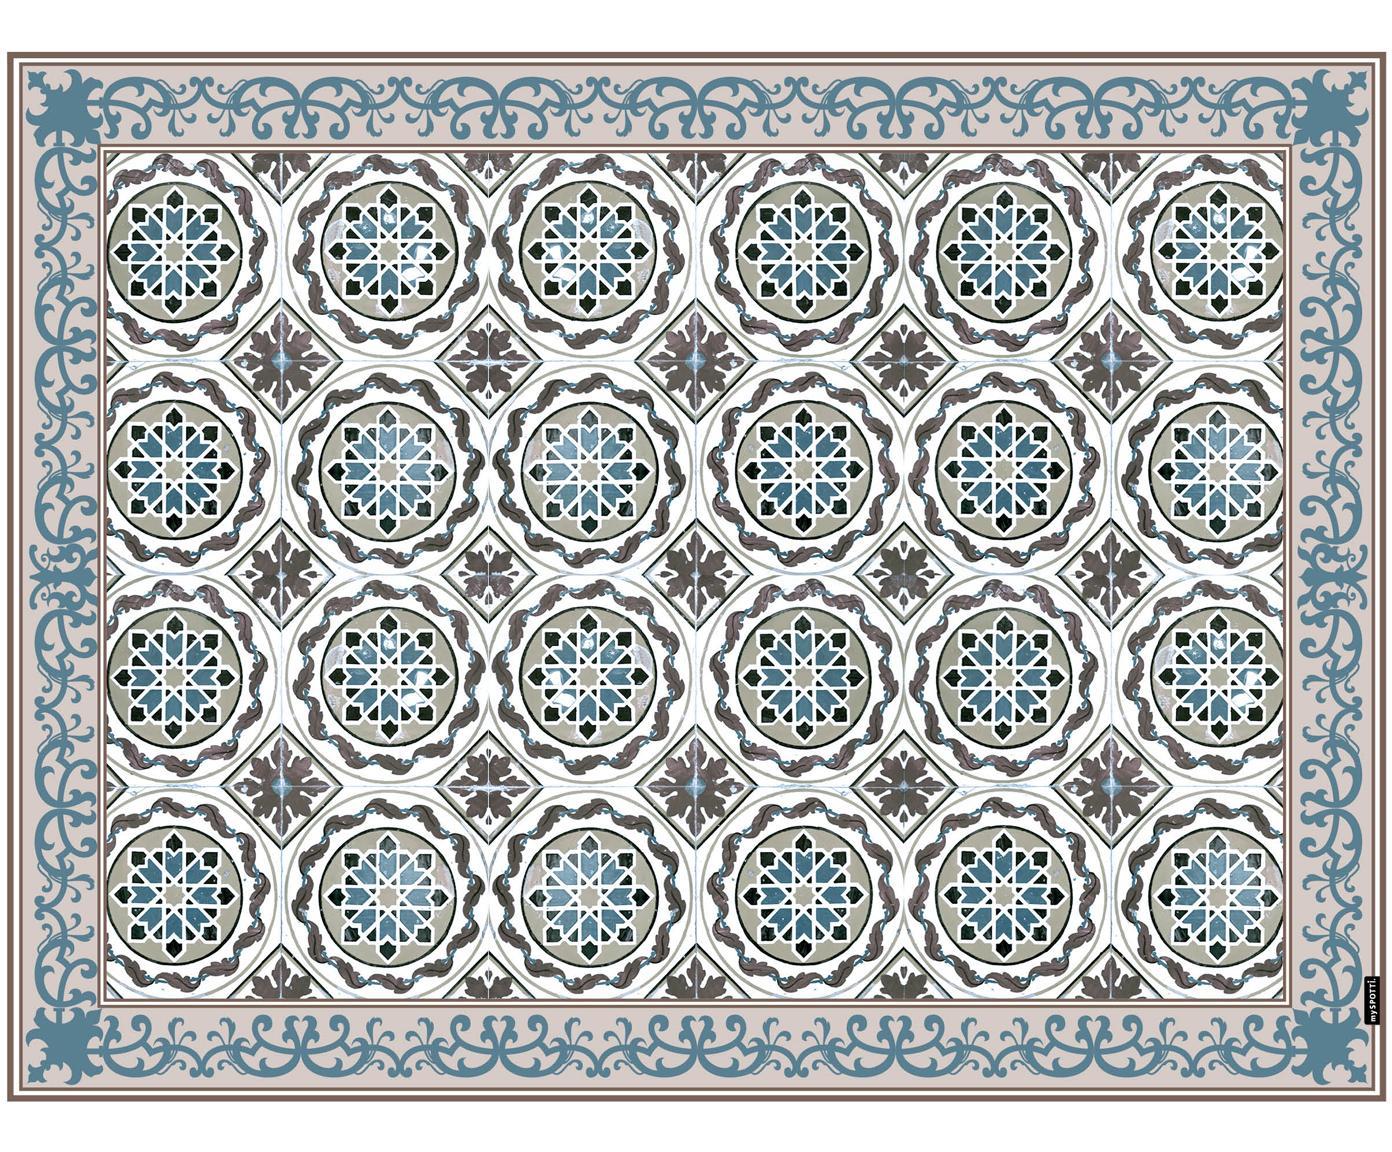 Alfombra vinílica Selina, Vinilo, reciclable, Beige, marrón, azul, An 65 x L 85 cm